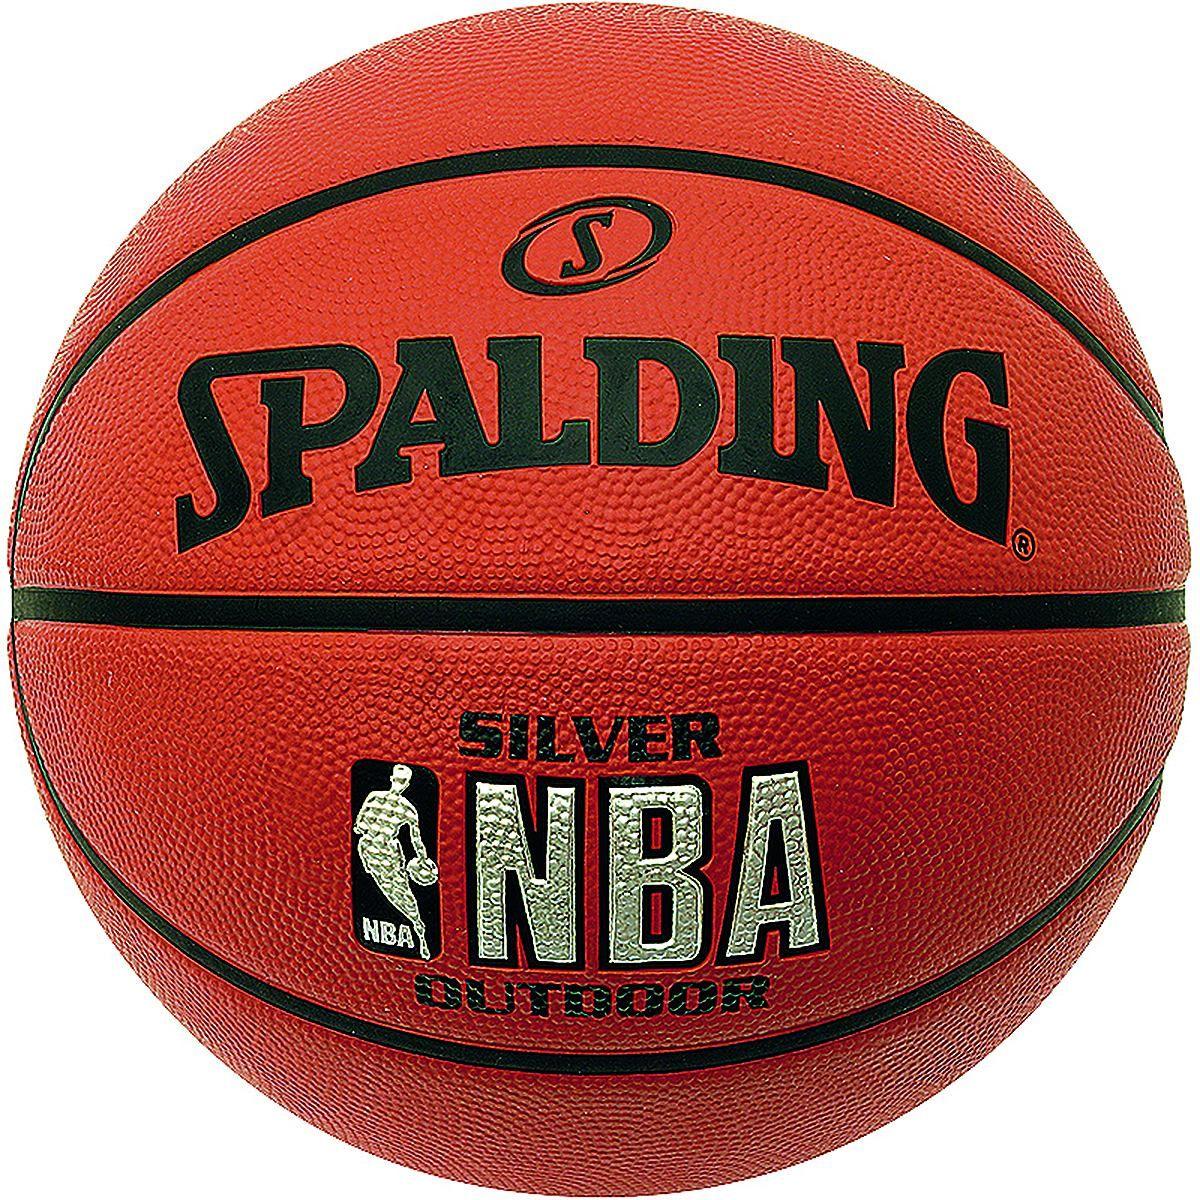 NBA Silver Outdoor Basketball    Top Spieleigenschaften    Details:  Exzellenter Grip und sehr gute Ballkontrolle    Geschlecht: Unisex  Größe: 5  Material: Gummi  Sportart: Basketball...